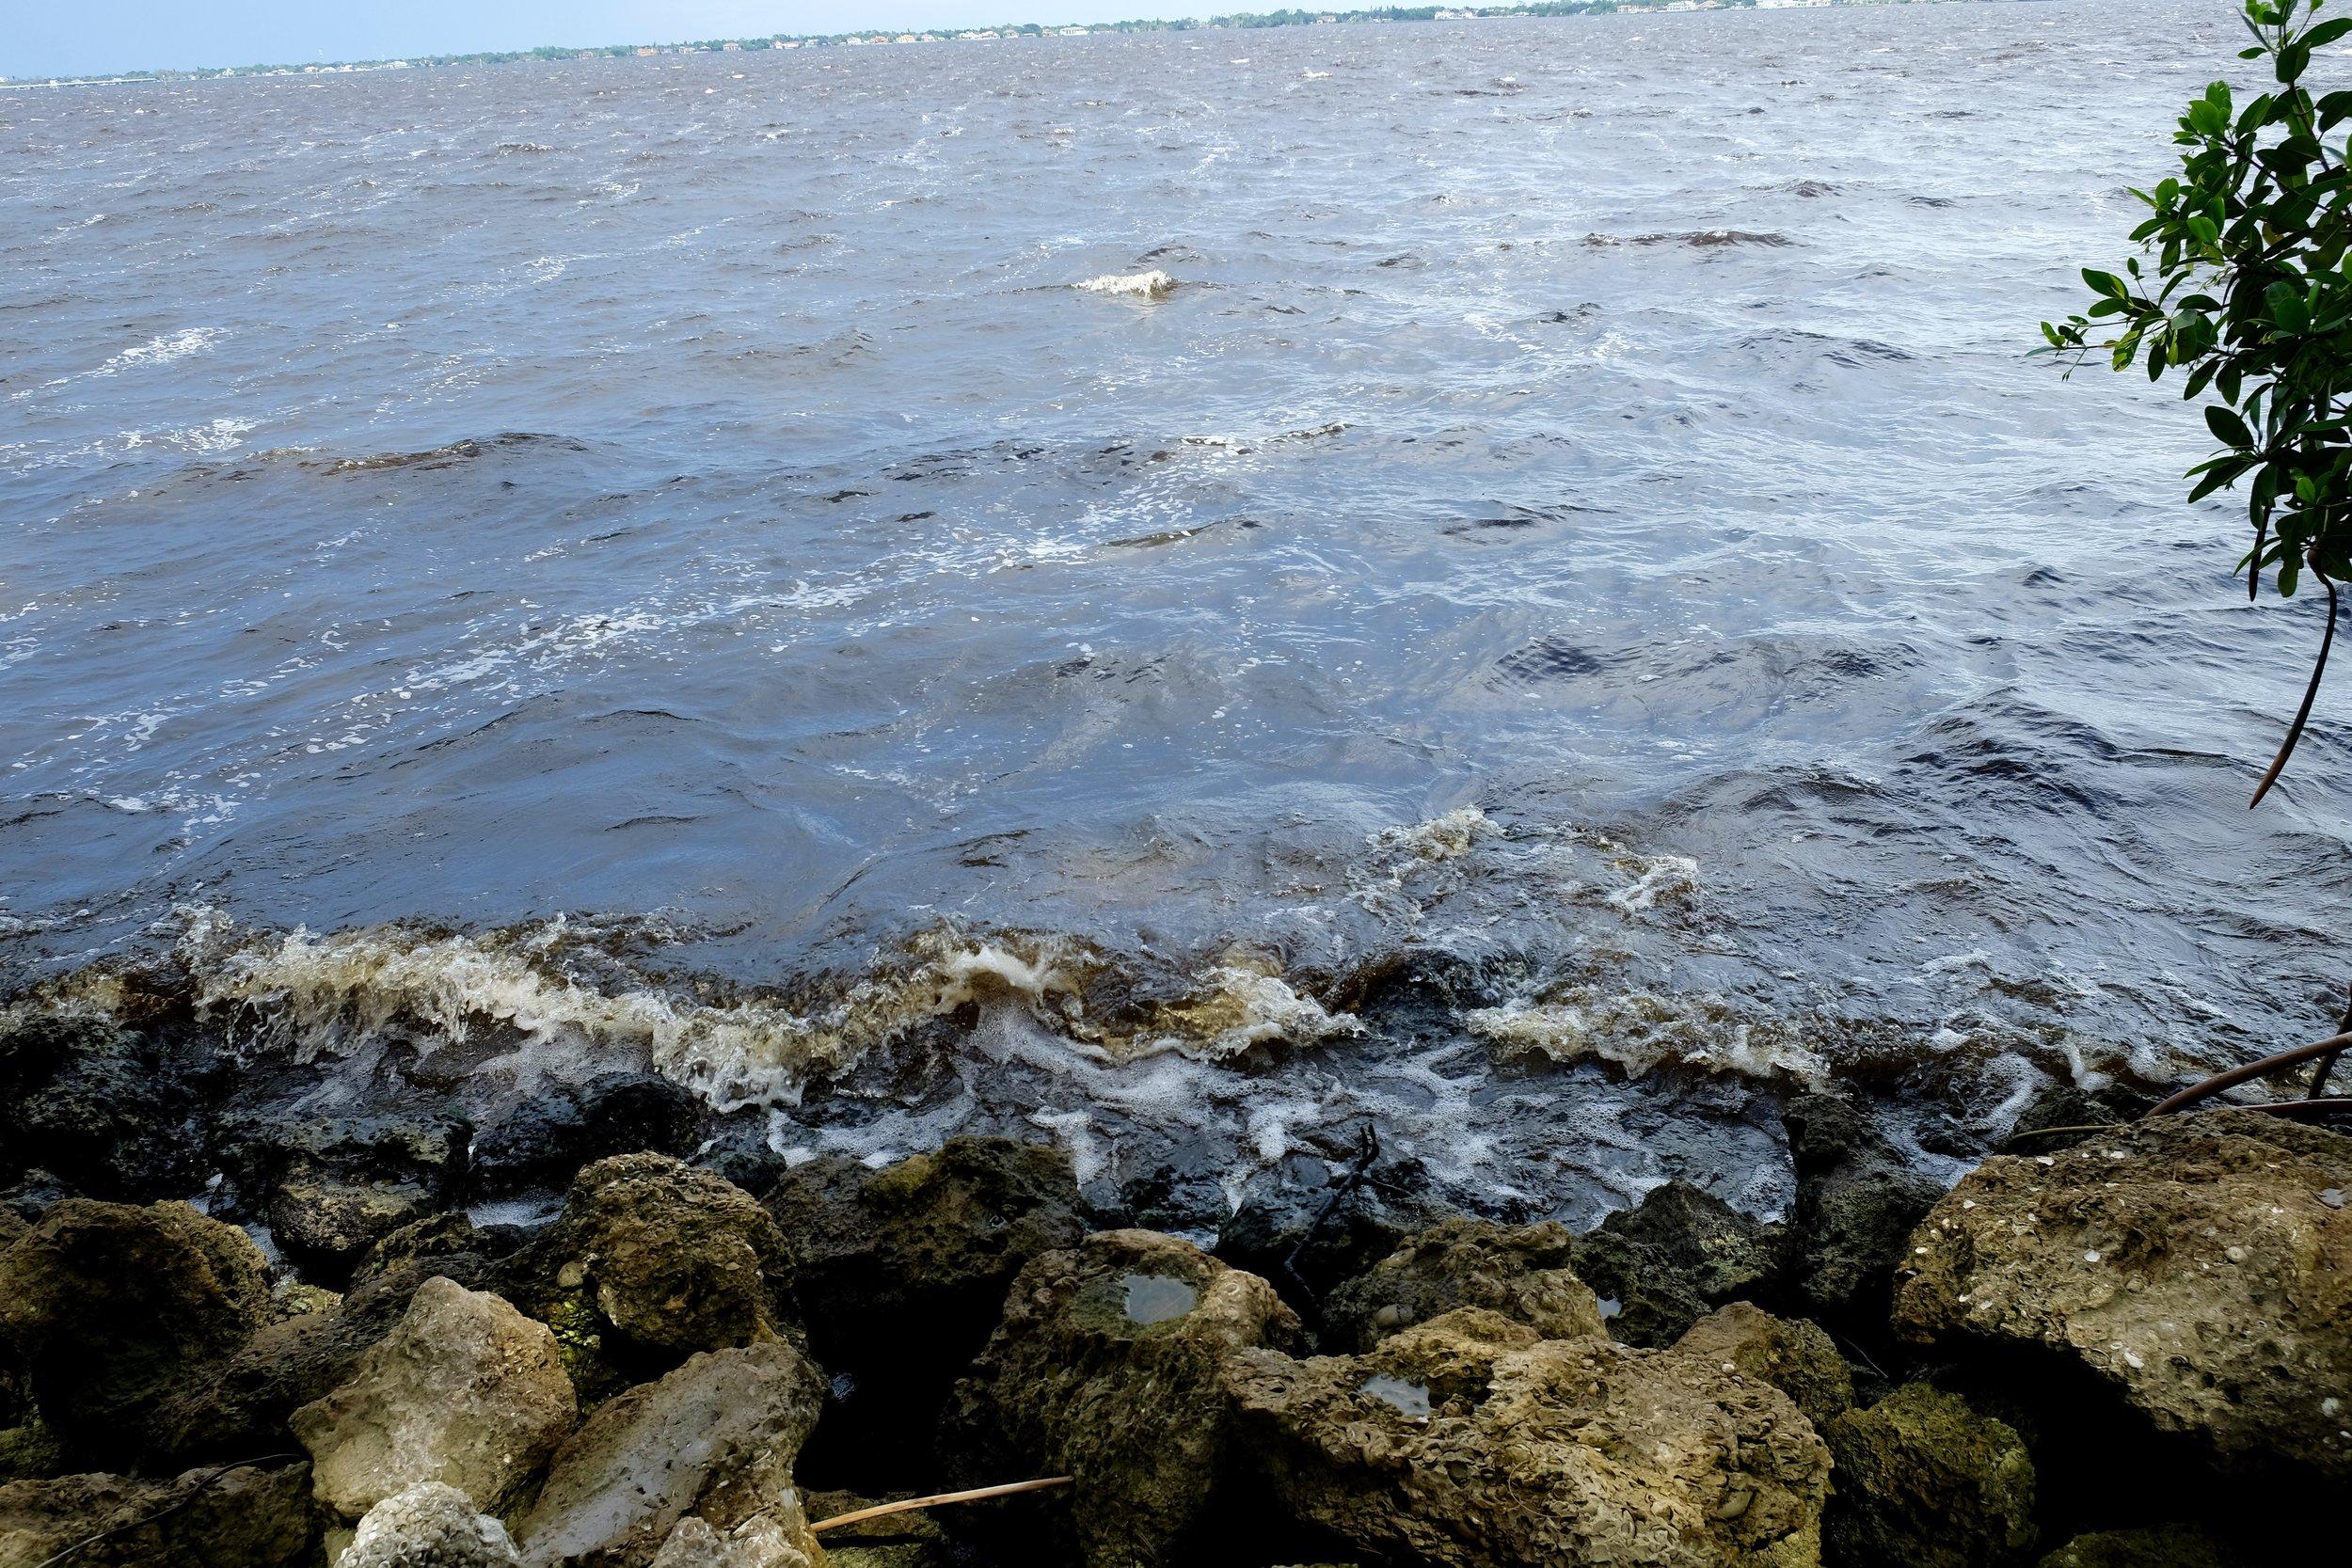 Cape Coral: Jaycee Park